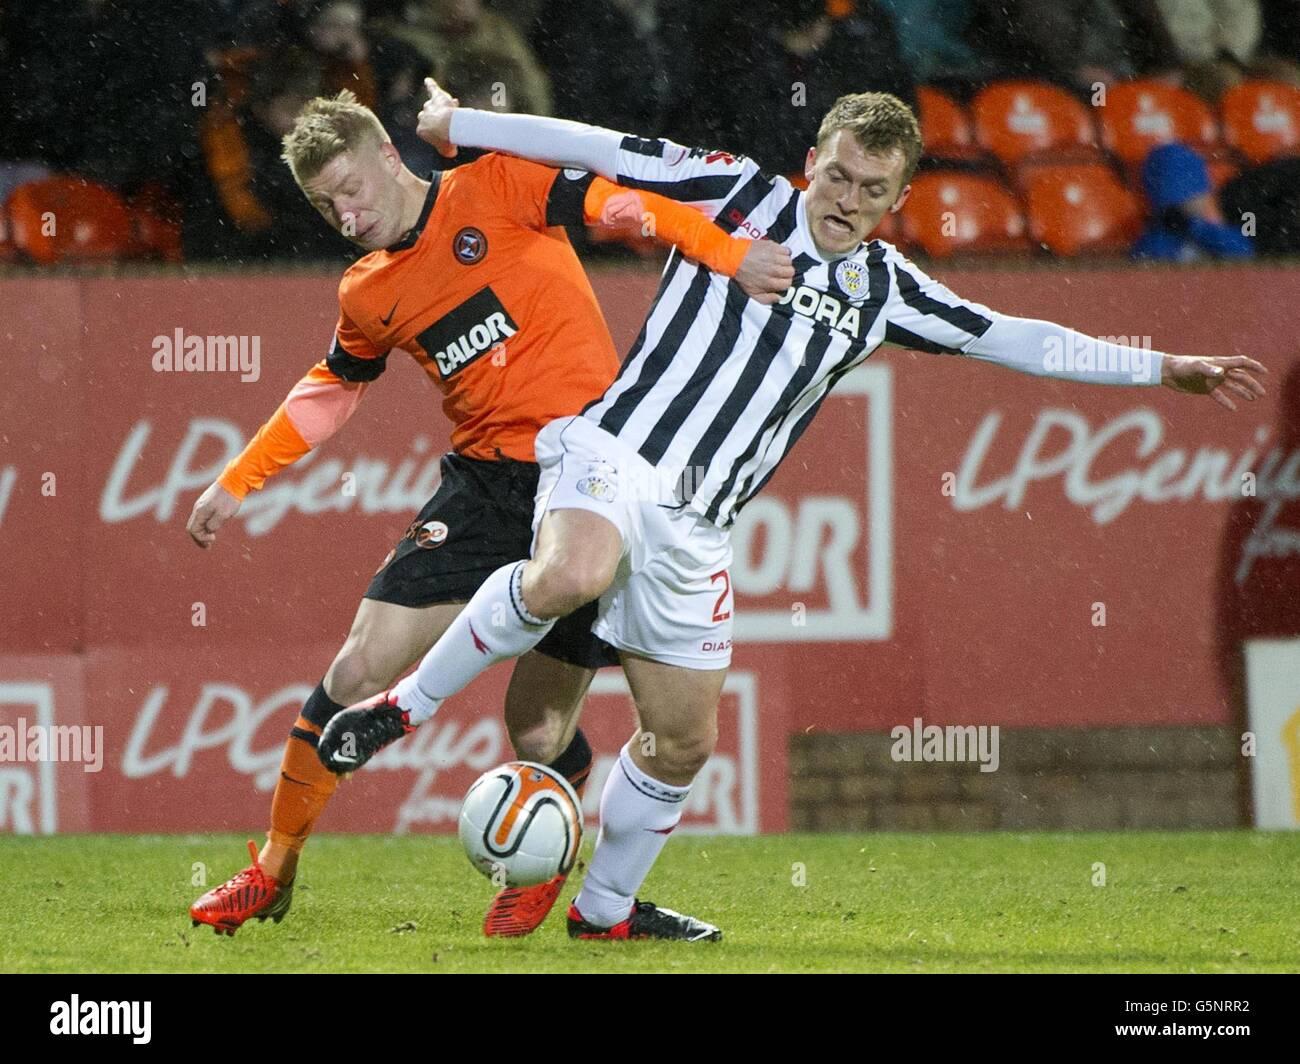 Soccer - Clydesdale Bank Scottish Premier League - Dundee United v St Mirren - Tannadice Park - Stock Image